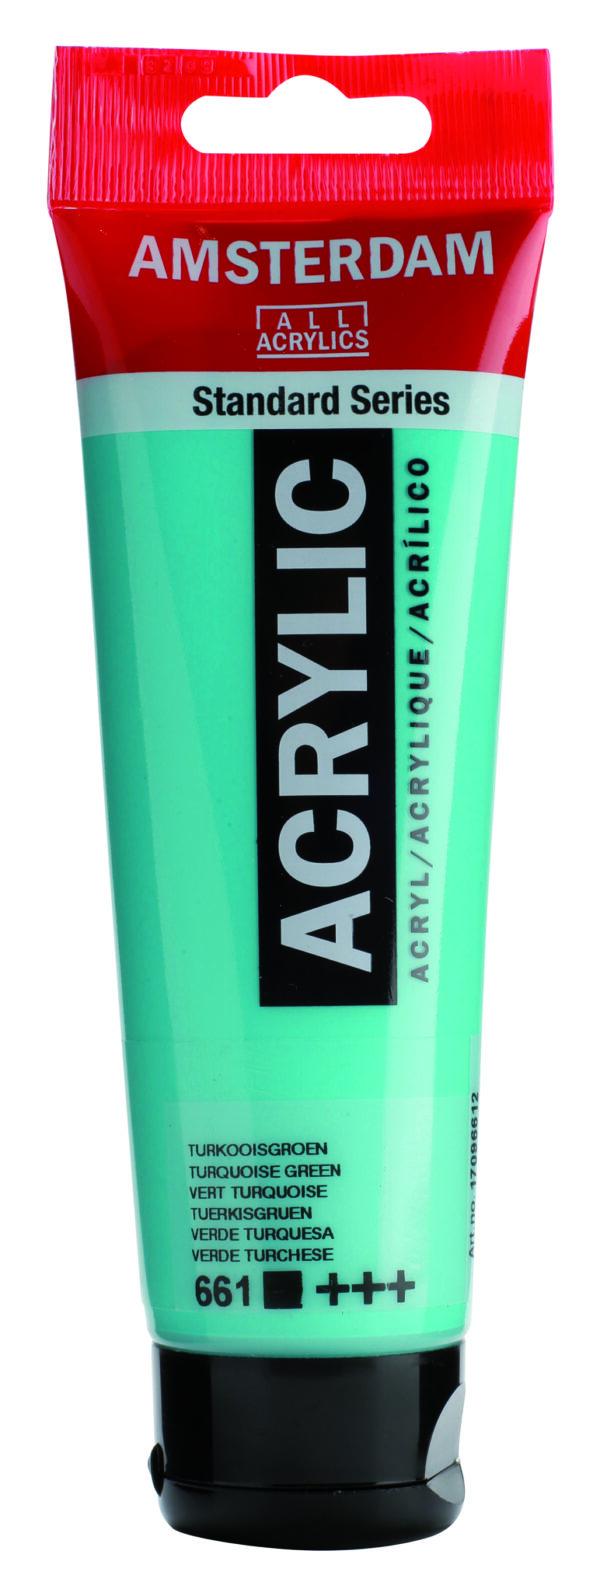 Ams std 661 Turquoise green - 120 ml